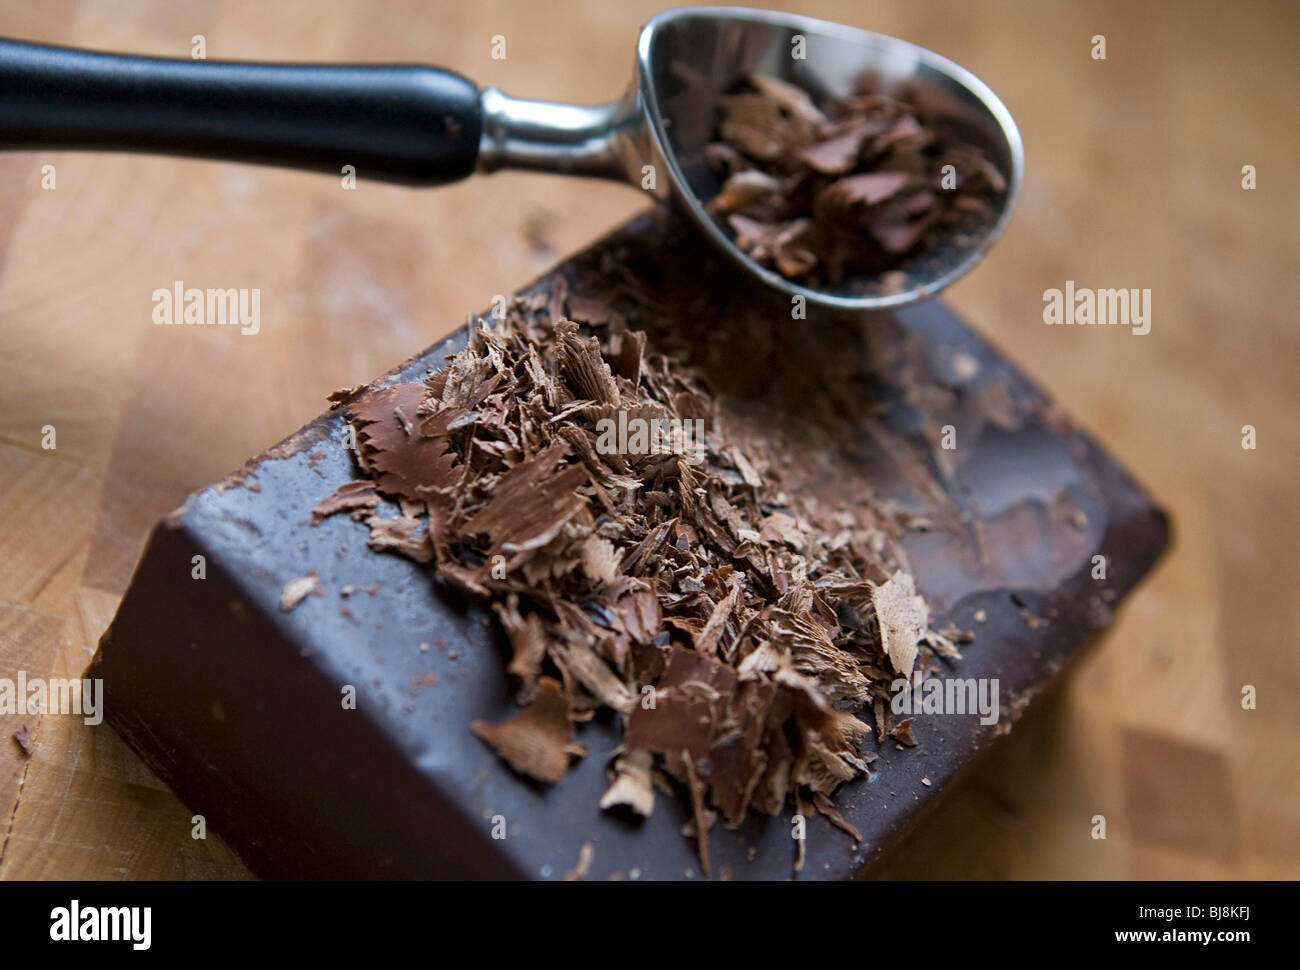 Un bloque de chocolate negro y virutas de chocolate oscuro. Imagen De Stock